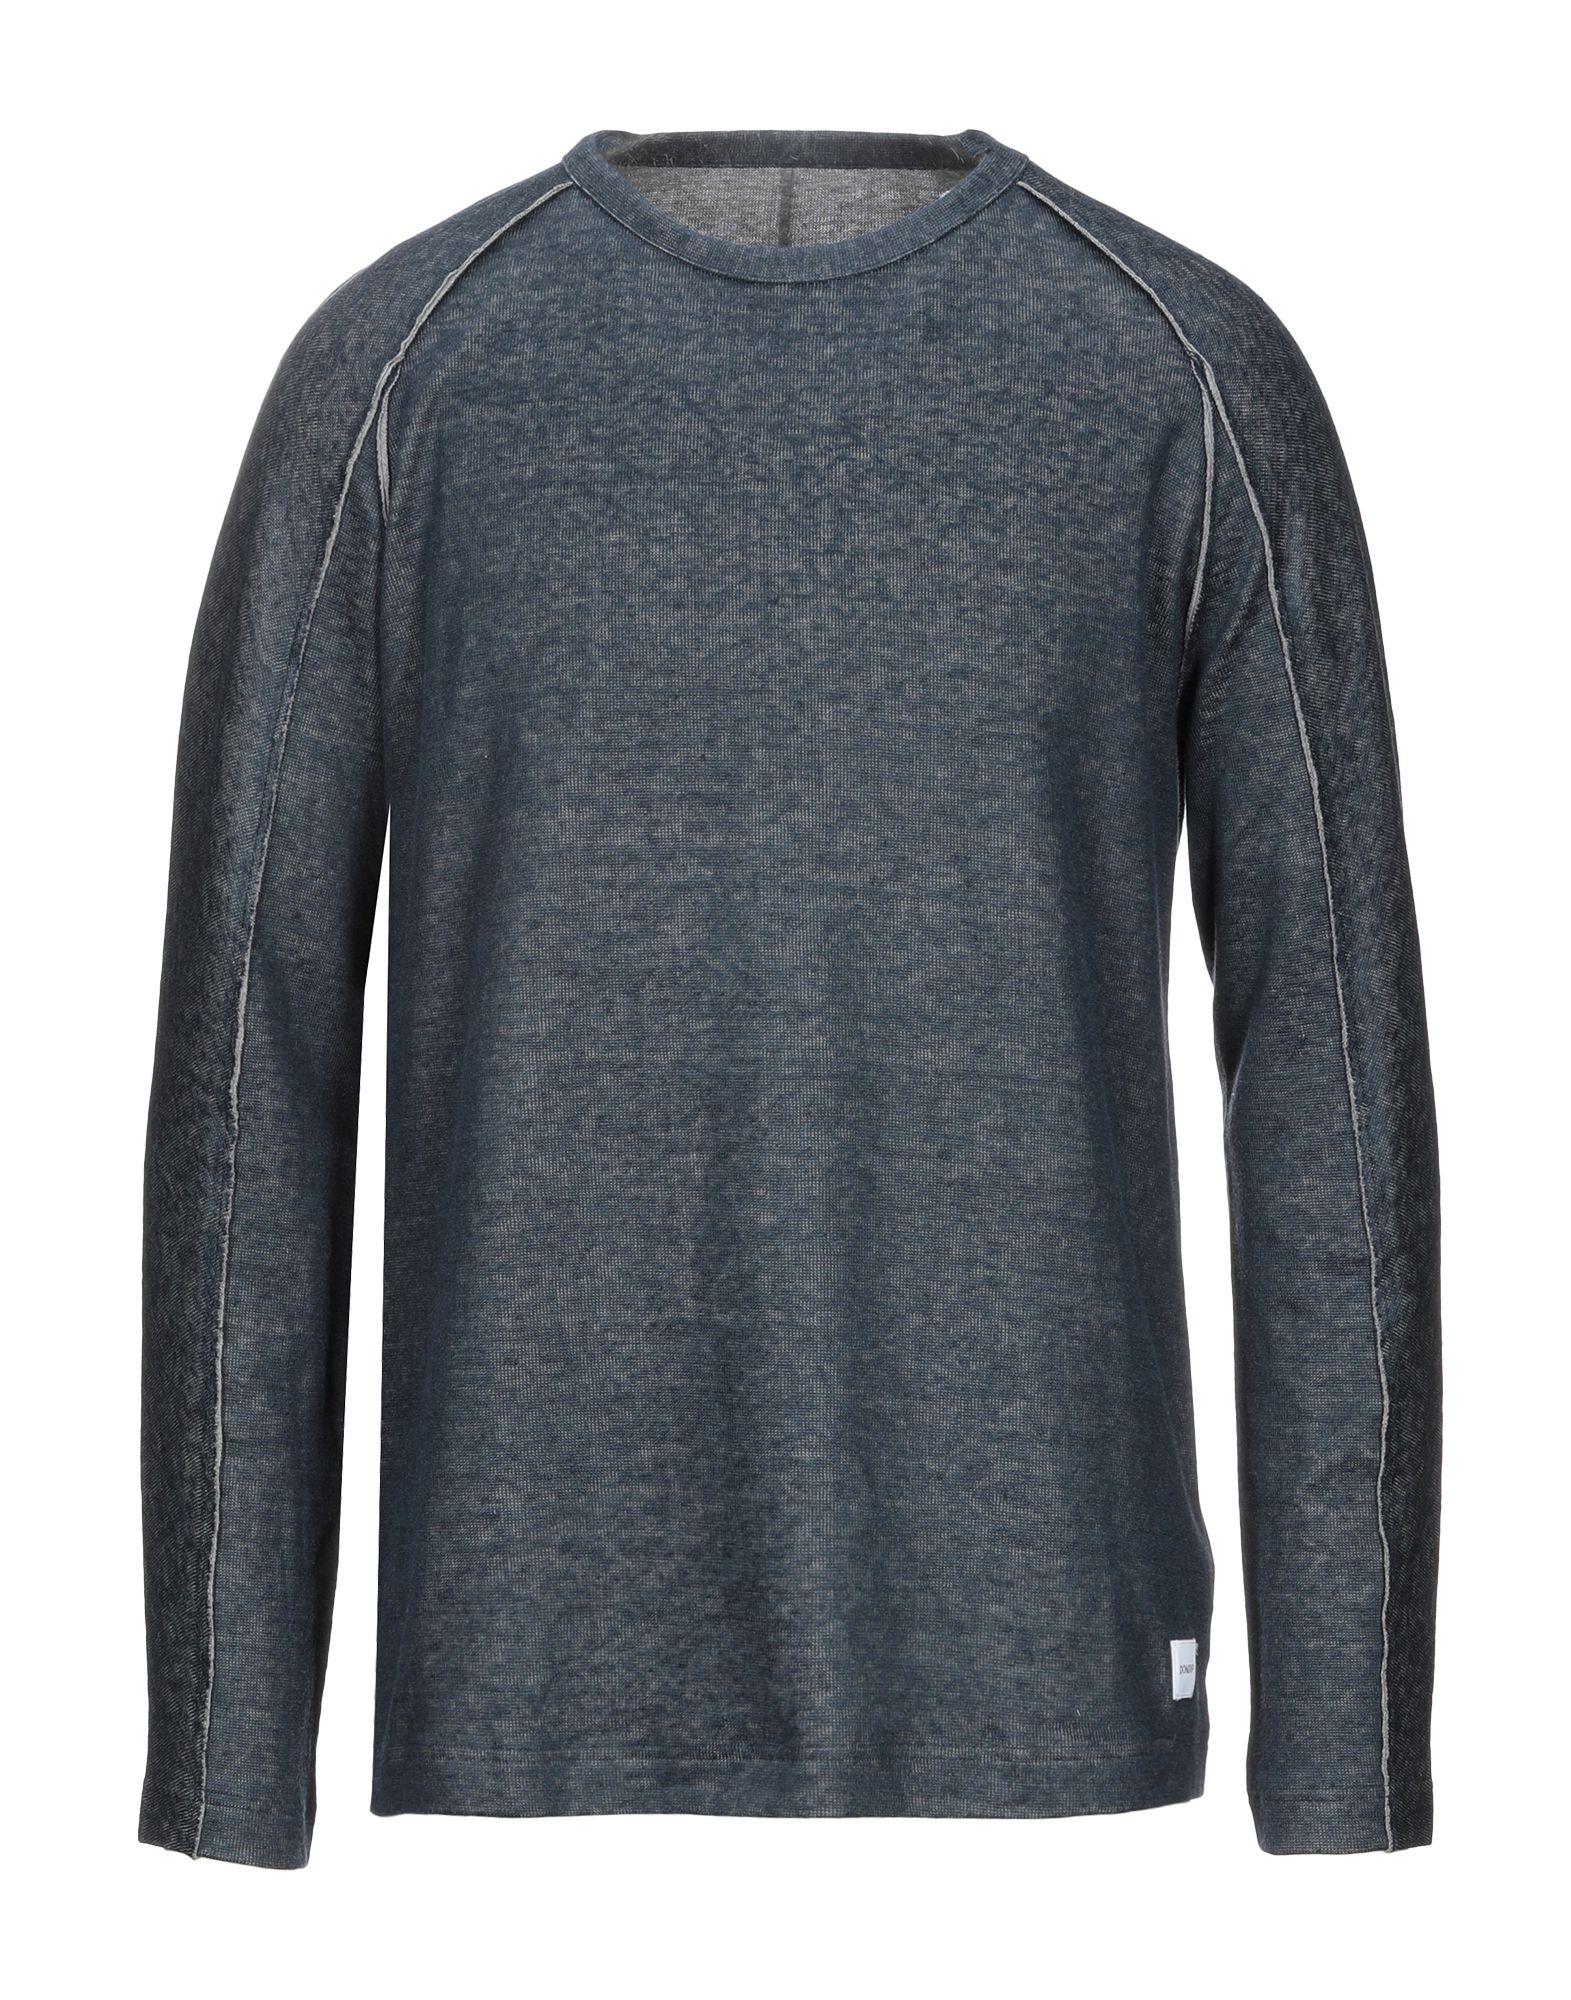 Acquista T su Shirt online Uomo Dondup STZg0v